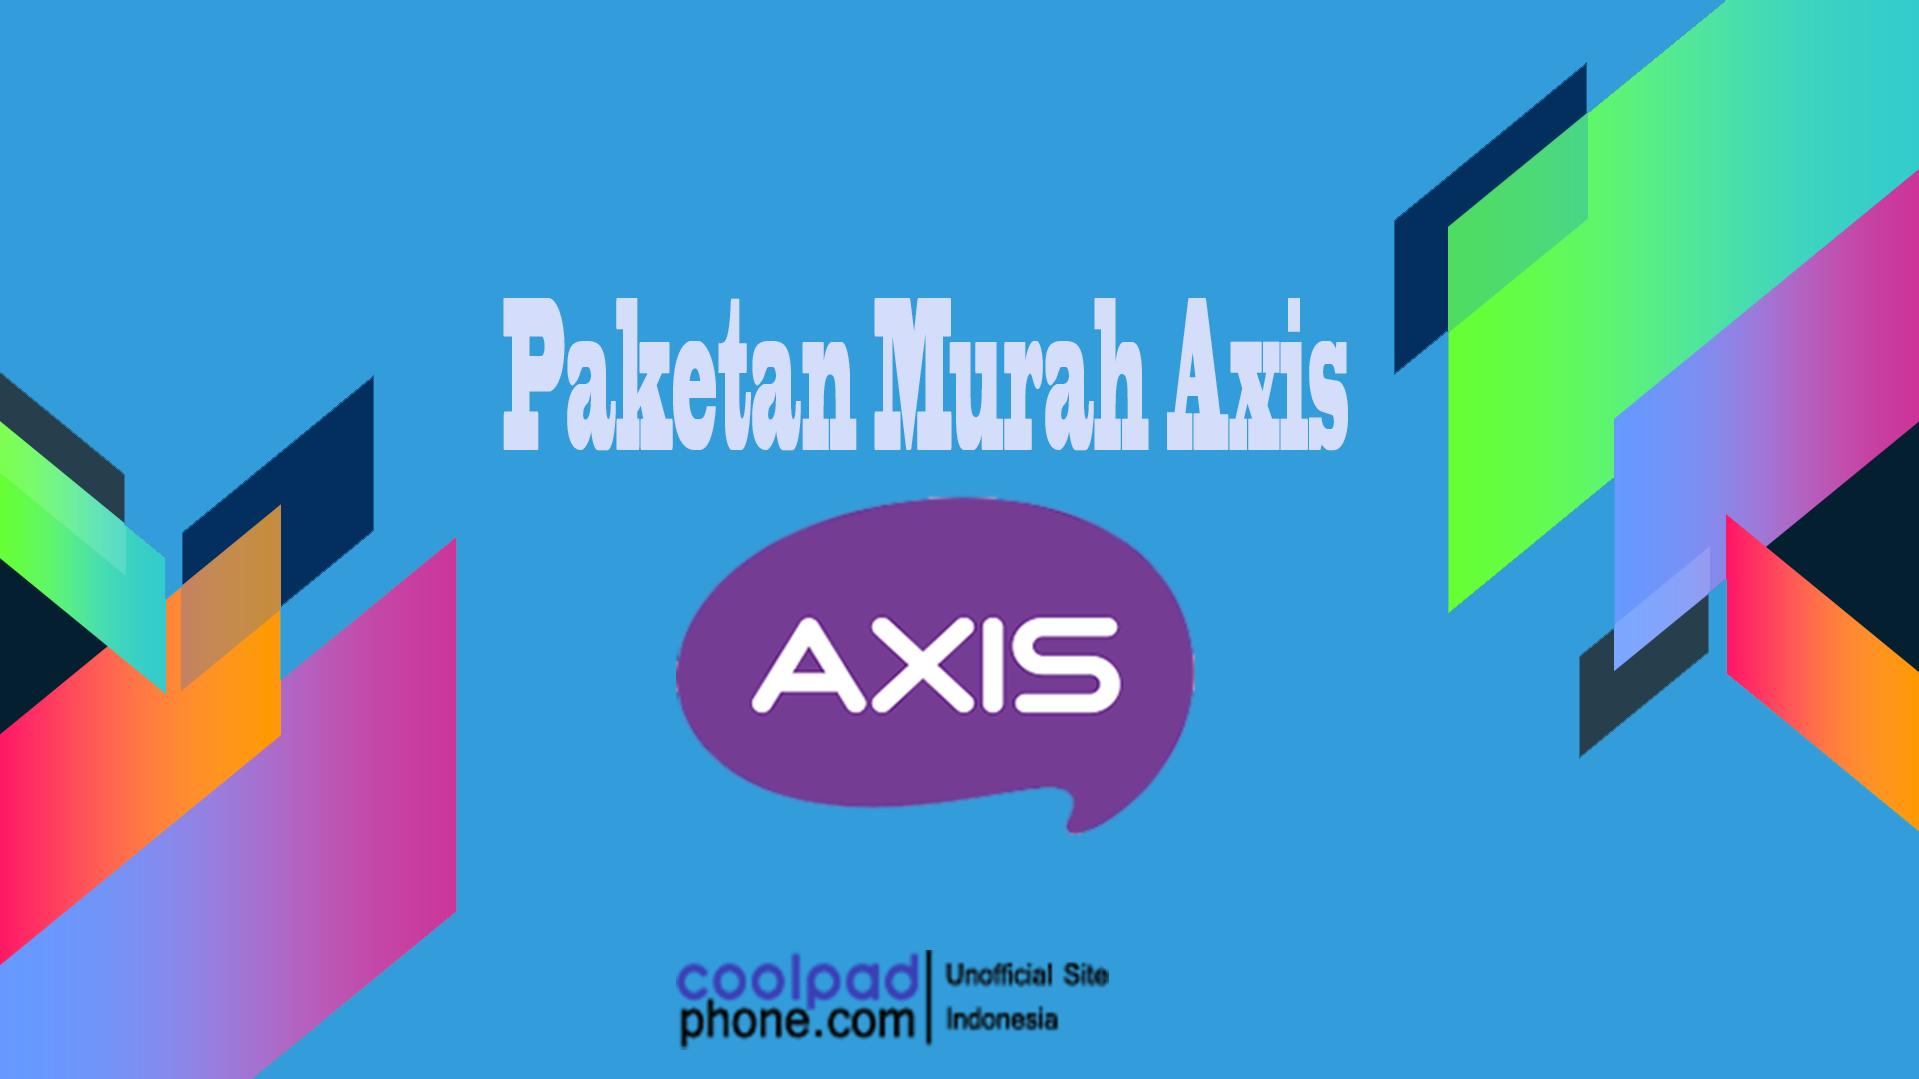 paketan-murah-axis